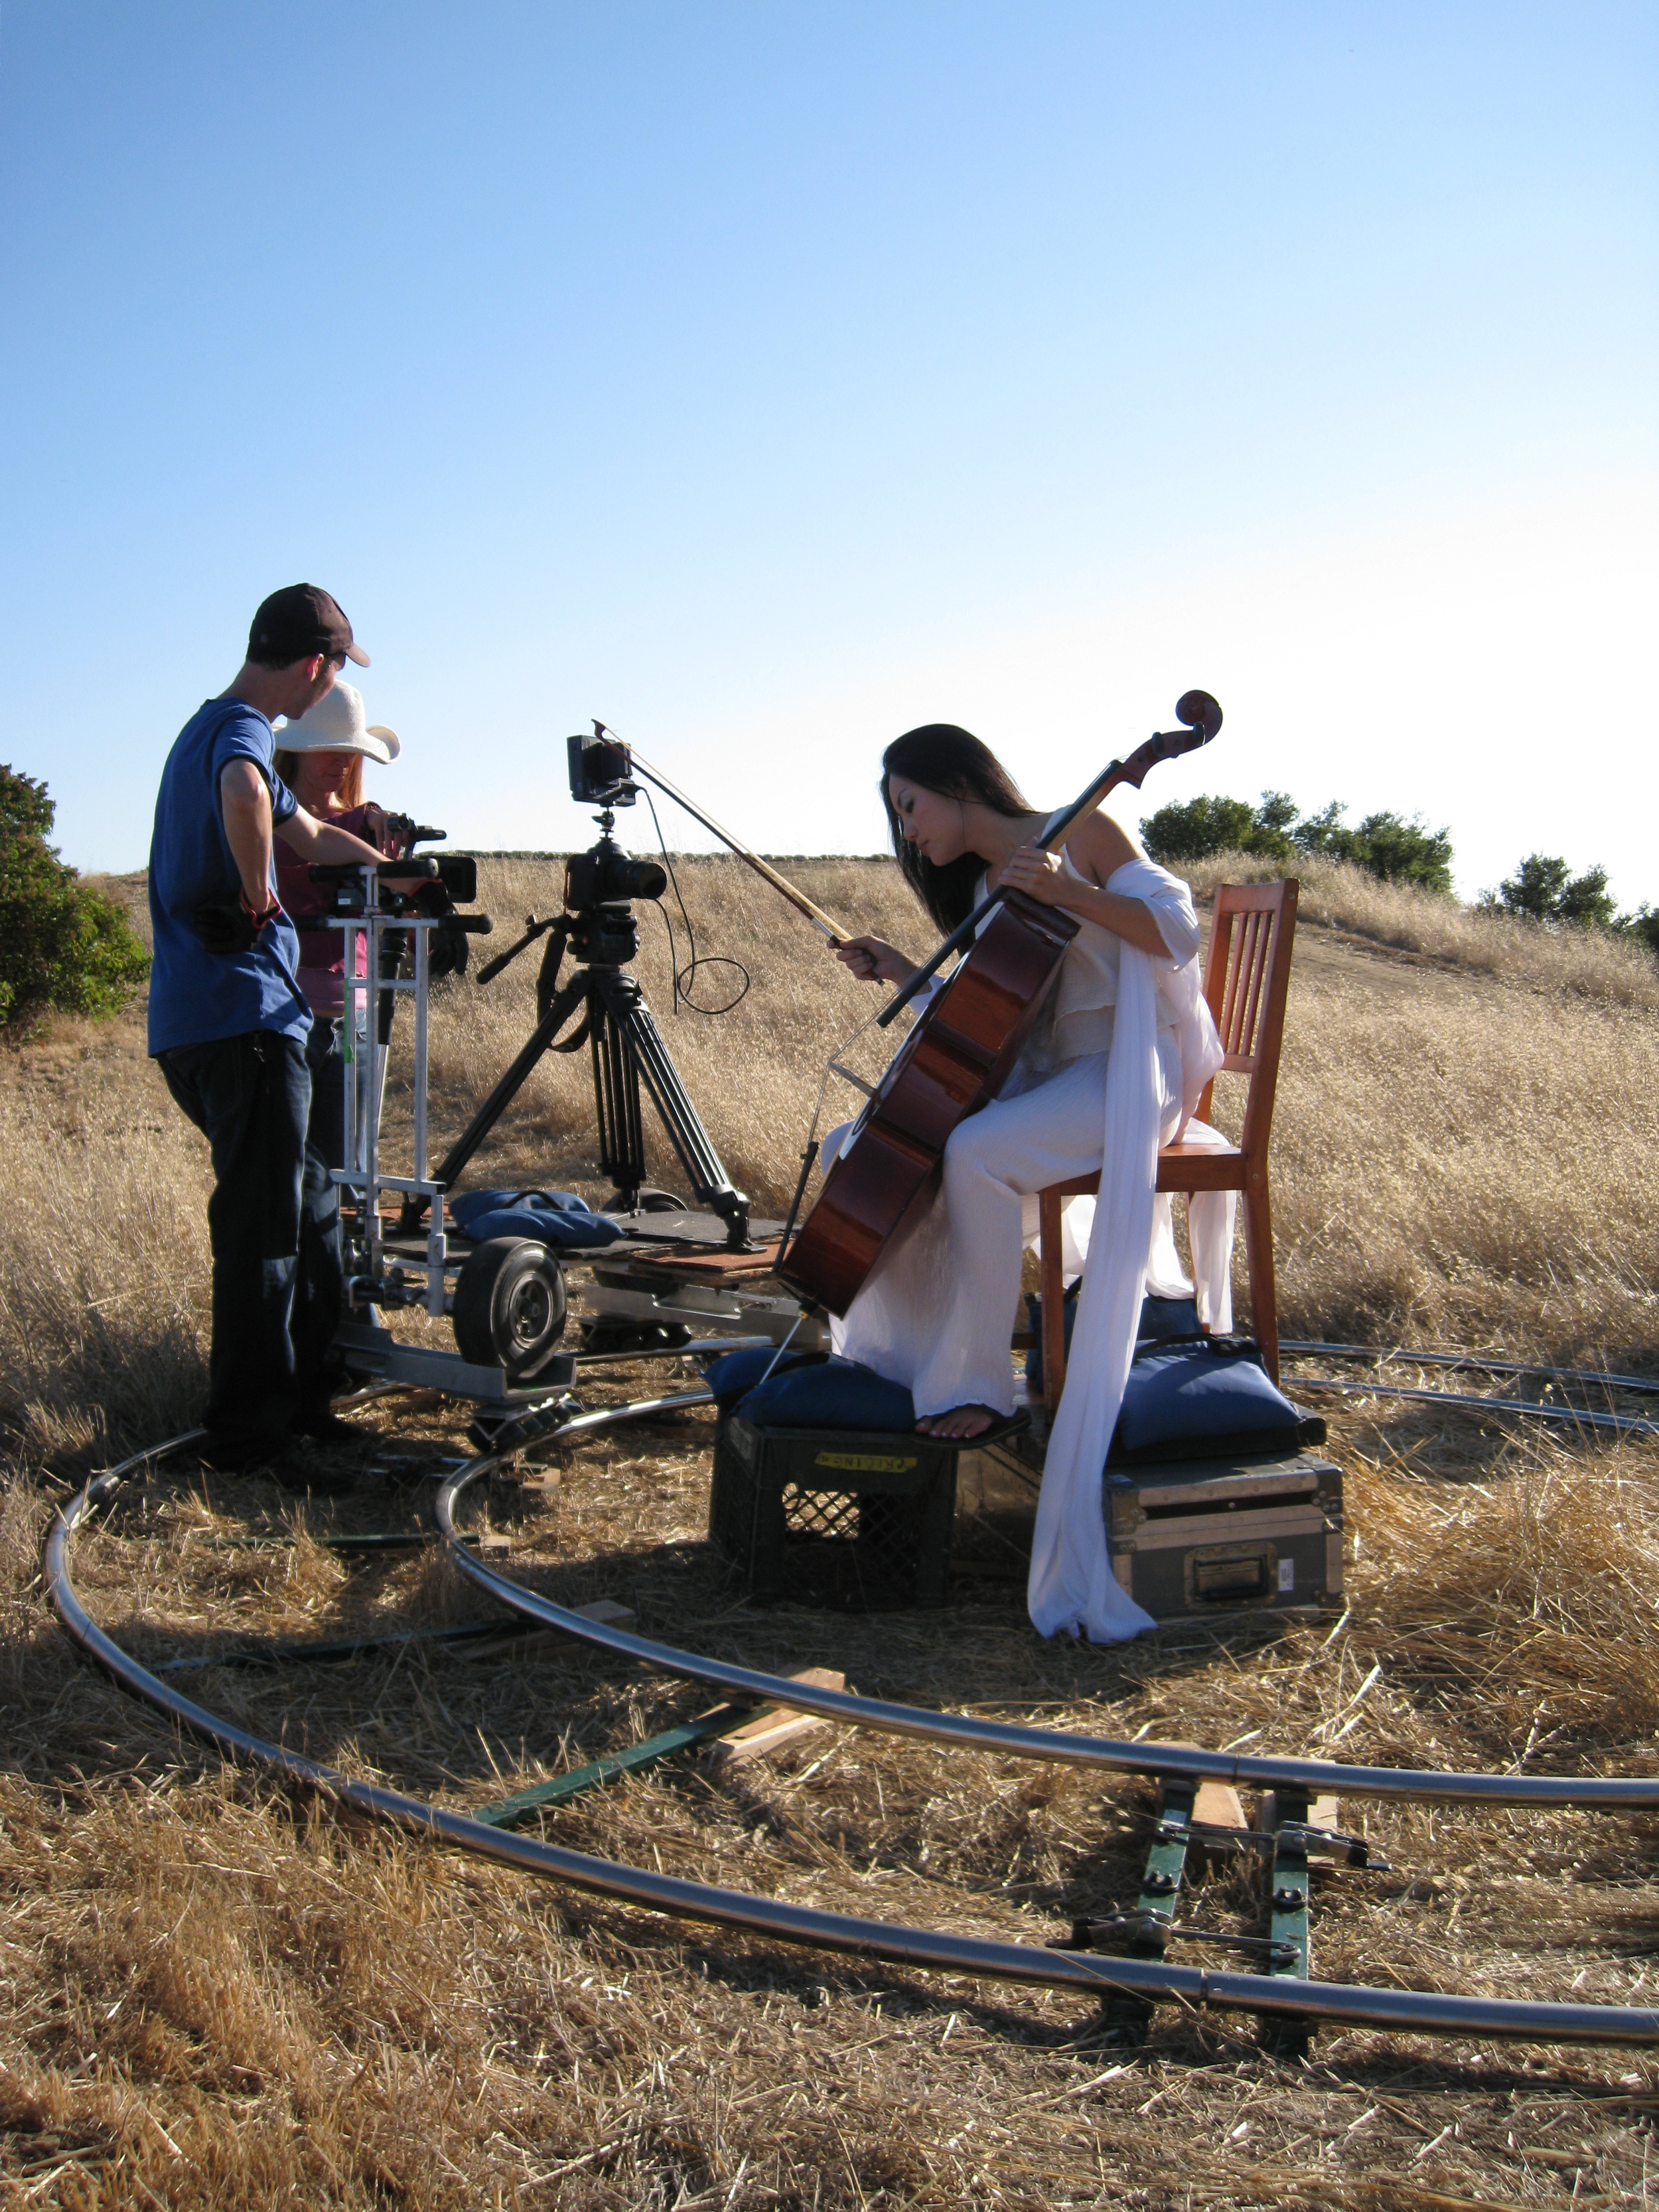 tina-guo-paul-spaeth-redemption-piano-cello-13.JPG